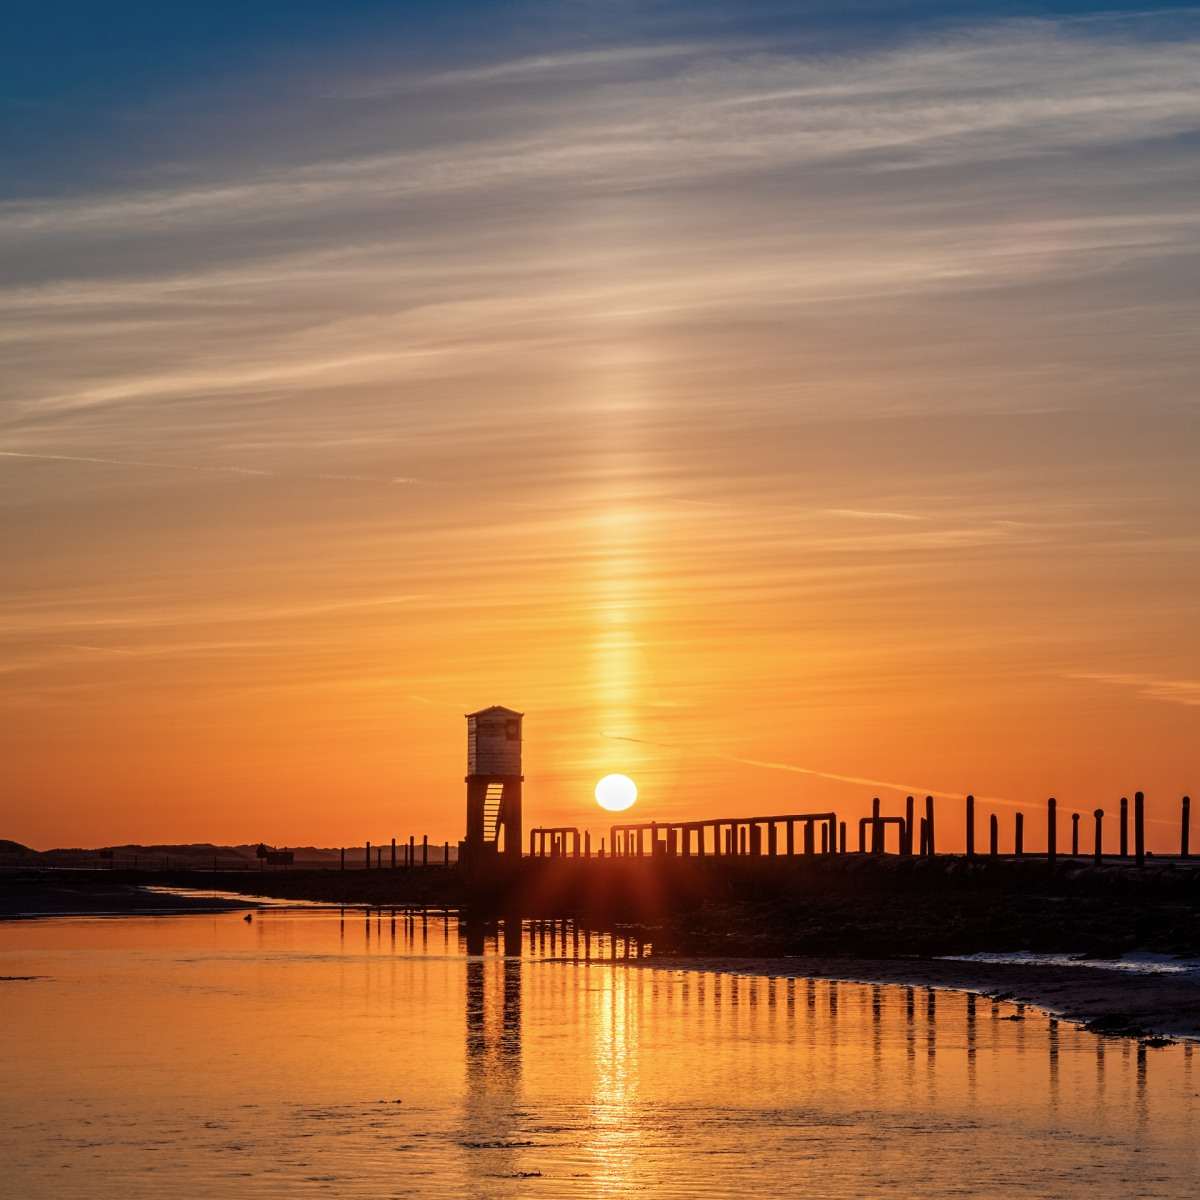 Holy island Causeway sunrise